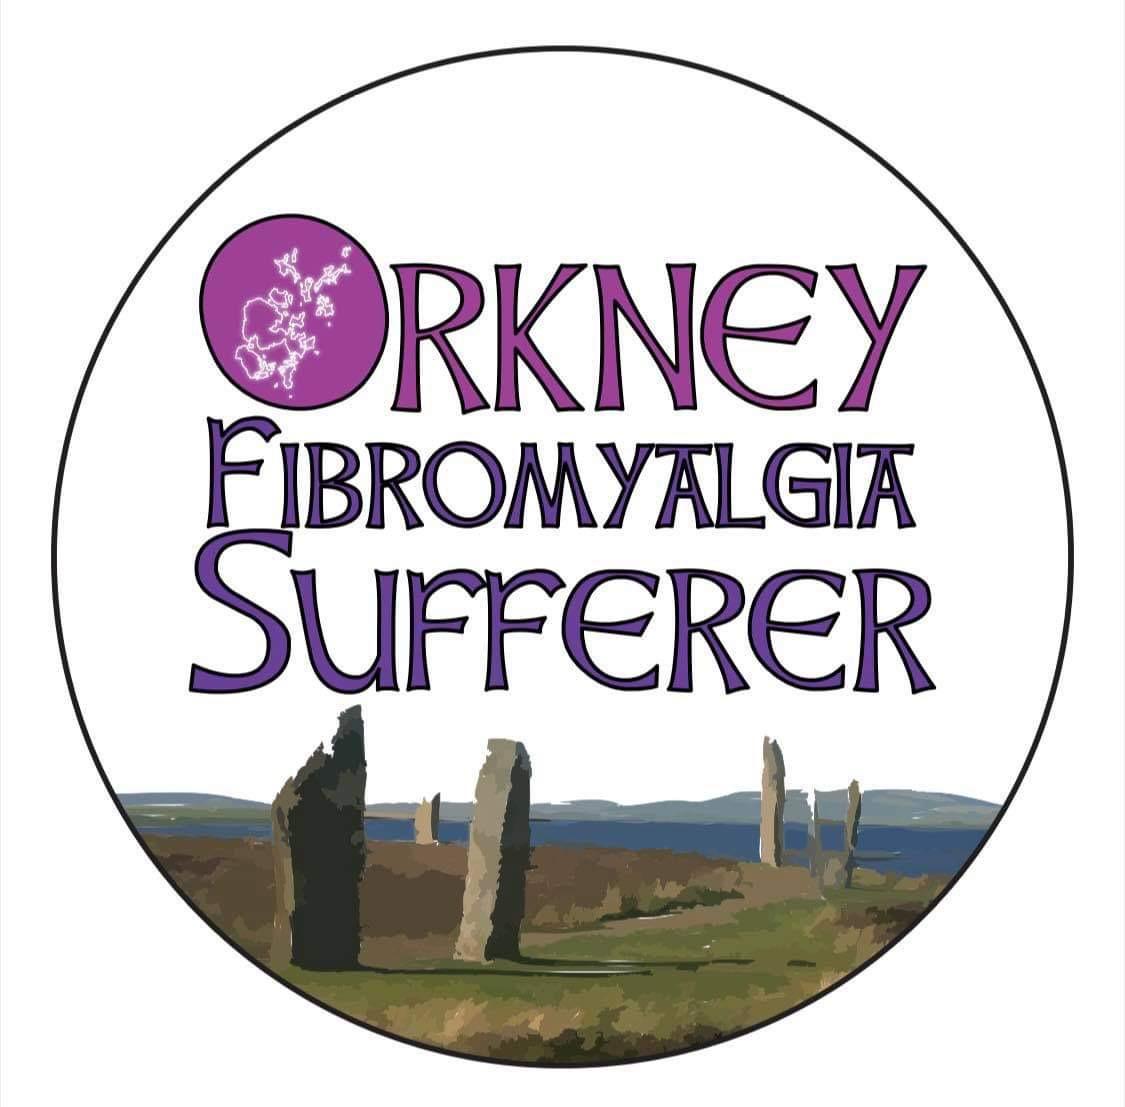 Orkney Fibromyalgia Sufferer